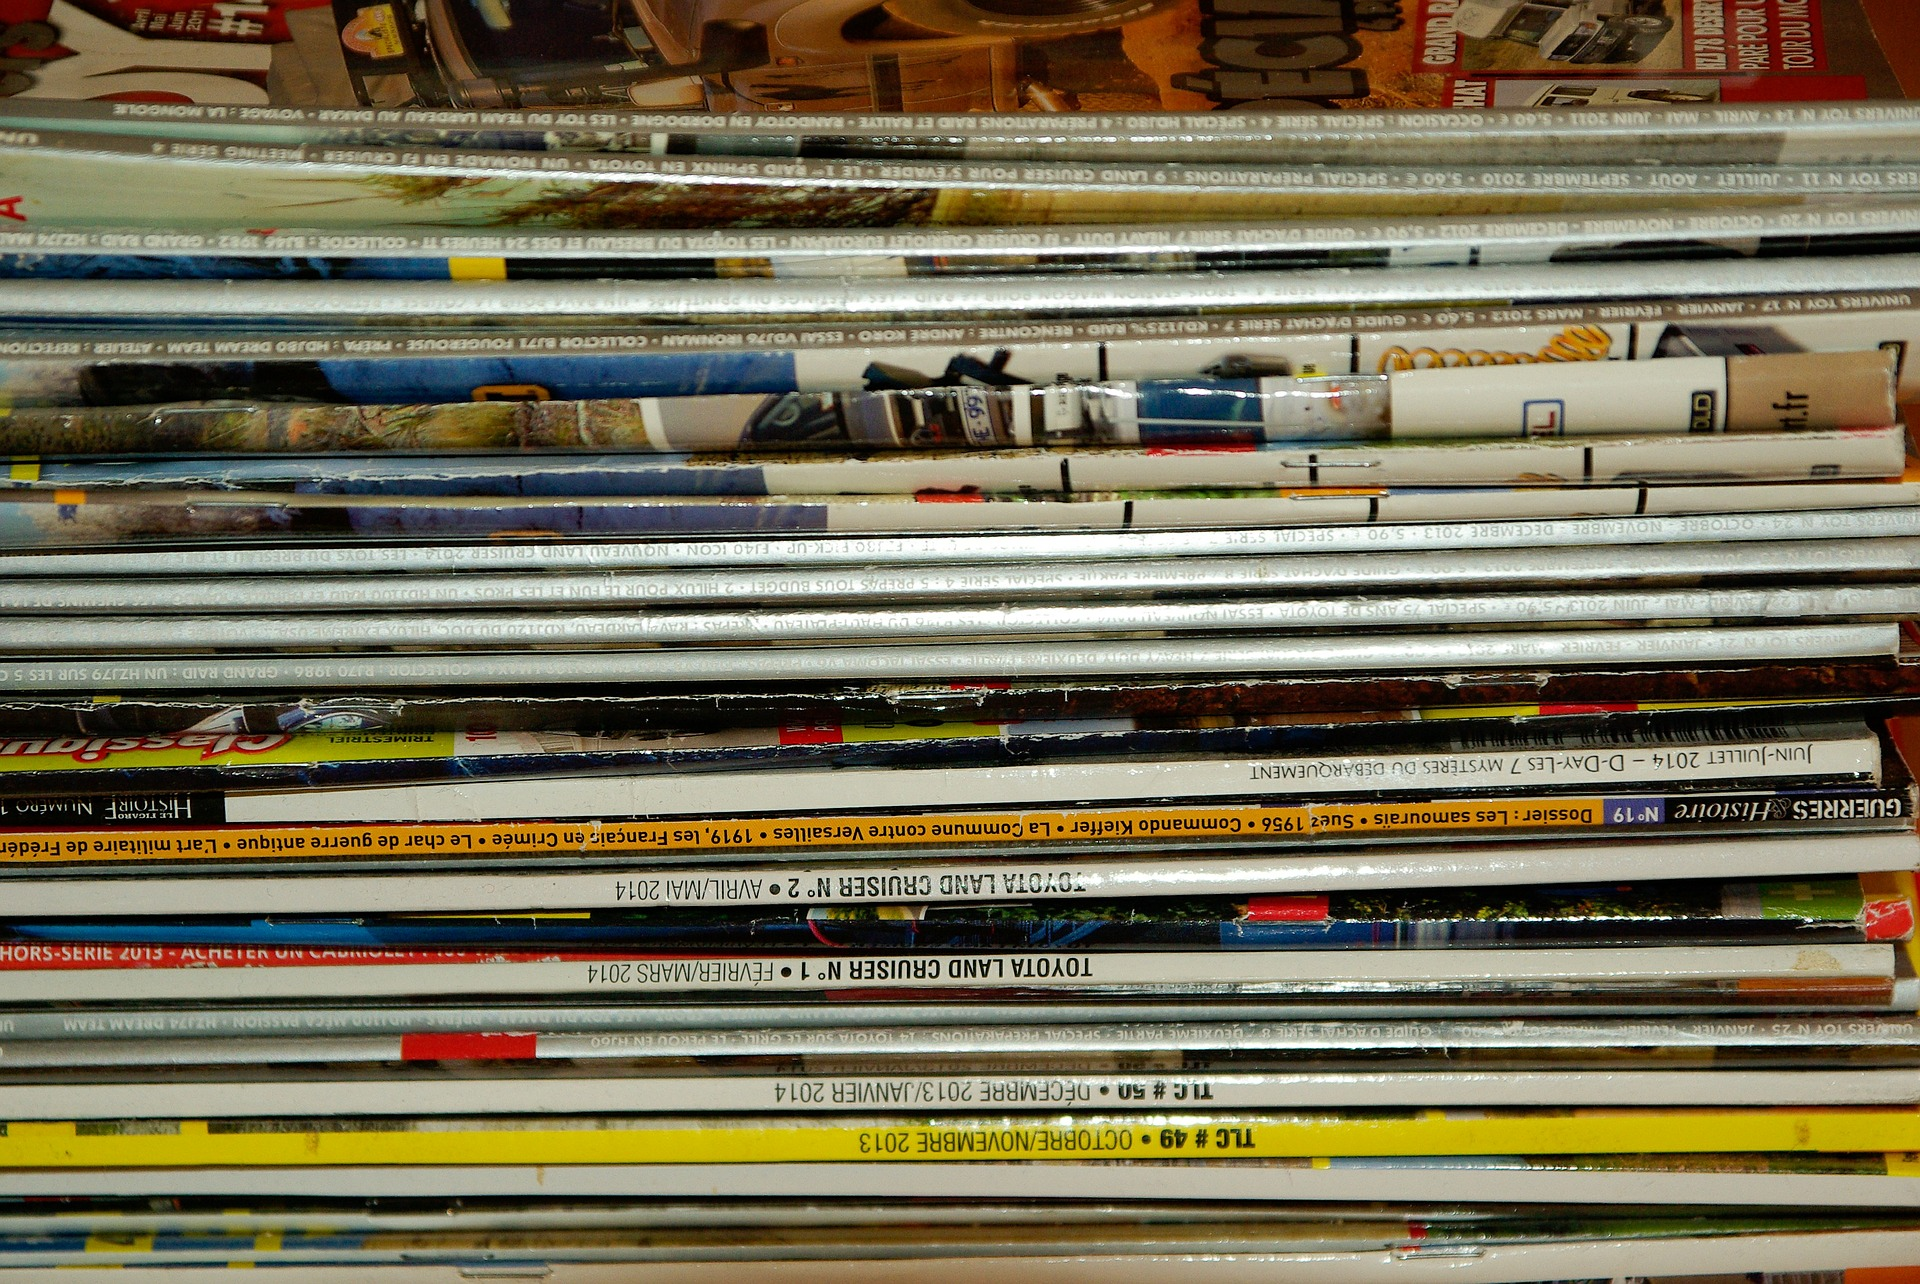 magazines-588349_1920-CCO-Public-Domain-download-text-ur-27_02_2018.jpg